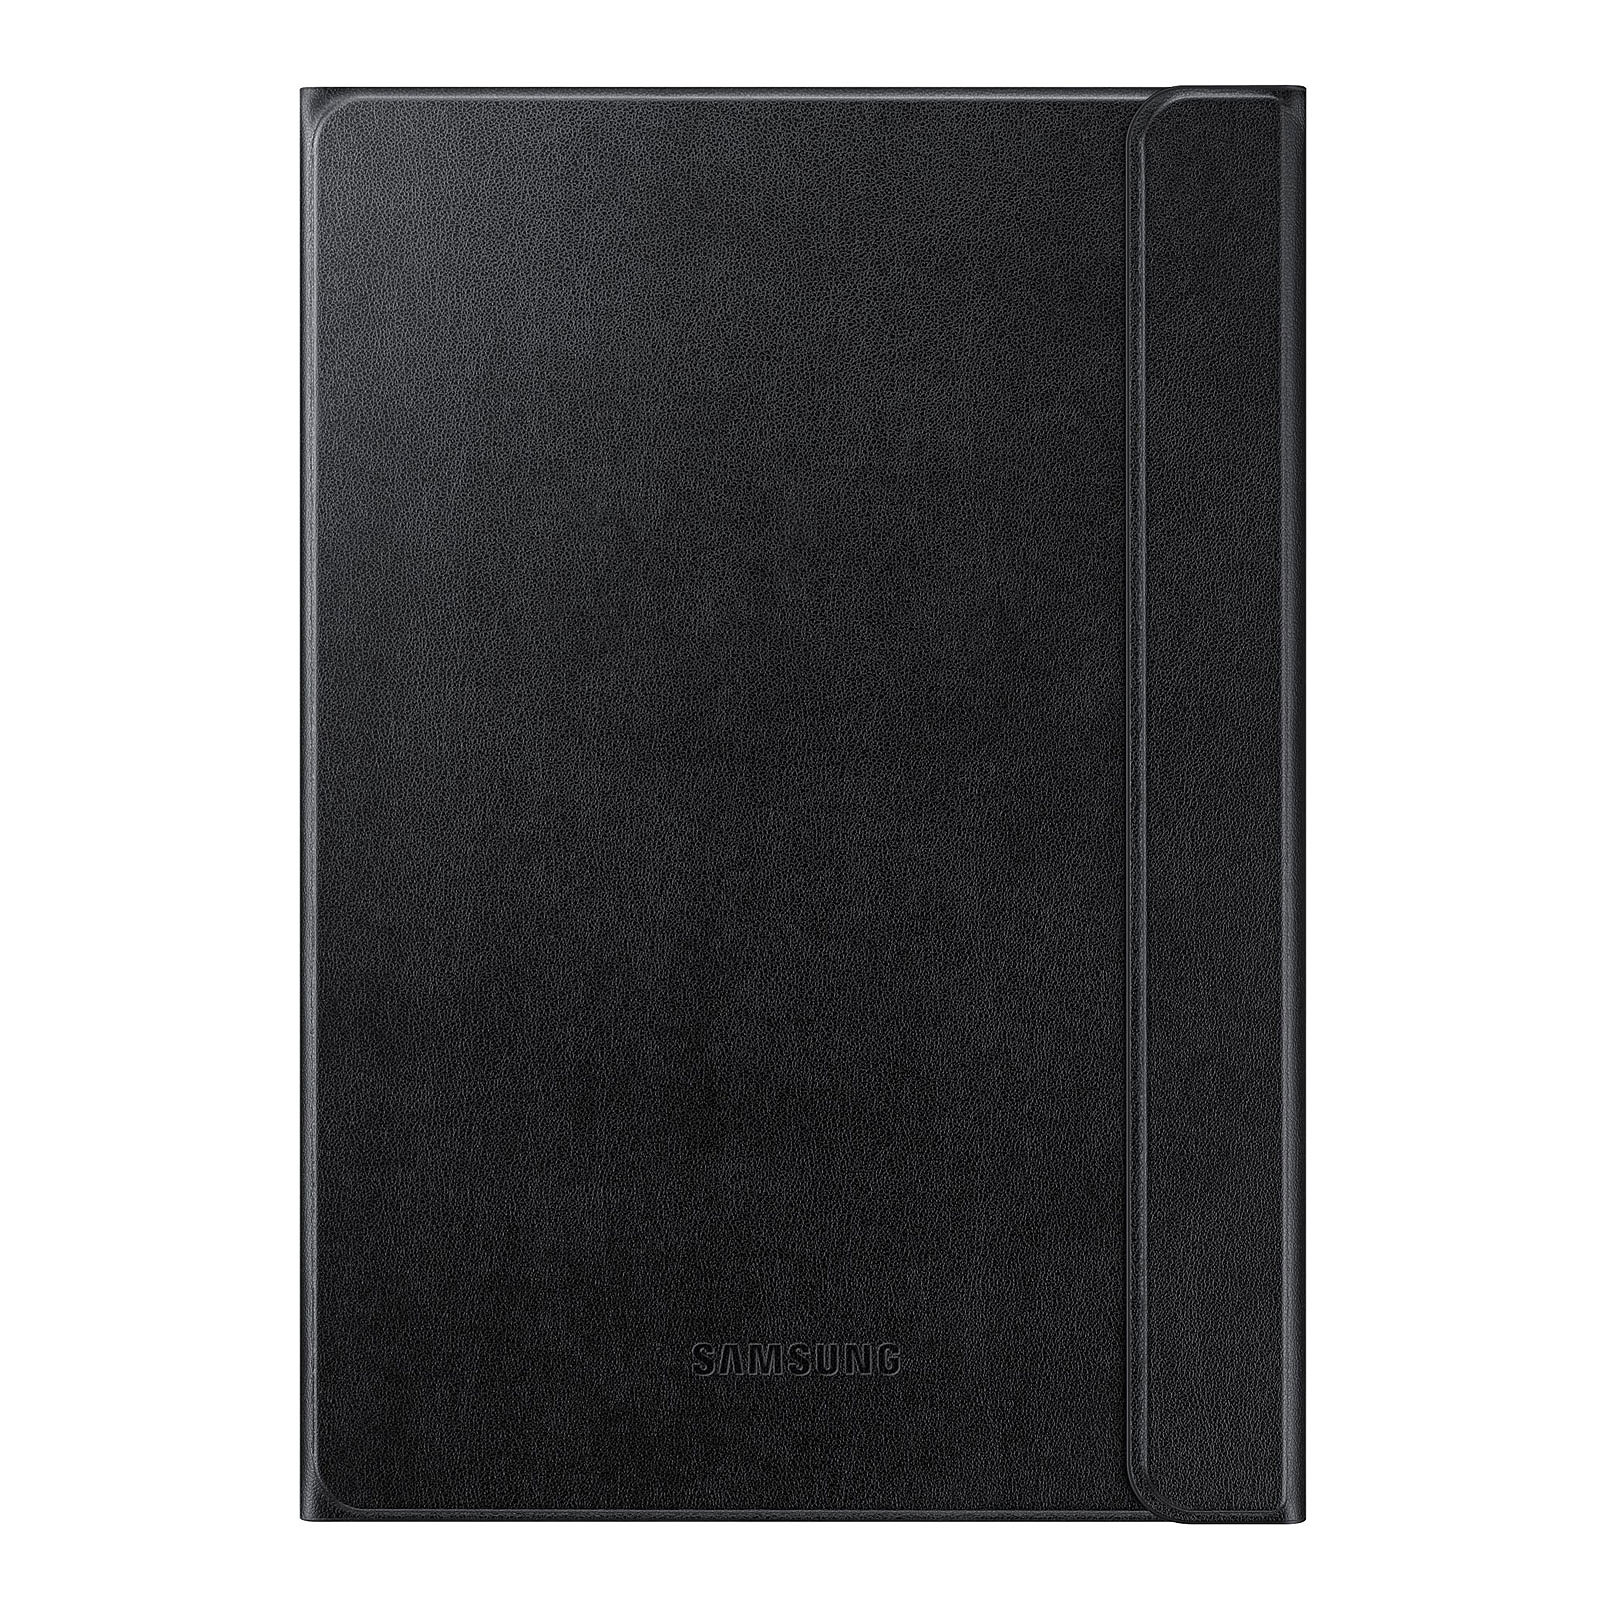 "Samsung Book Cover EF-BT550P Noir (pour Samsung Galaxy Tab A 9.7"")"